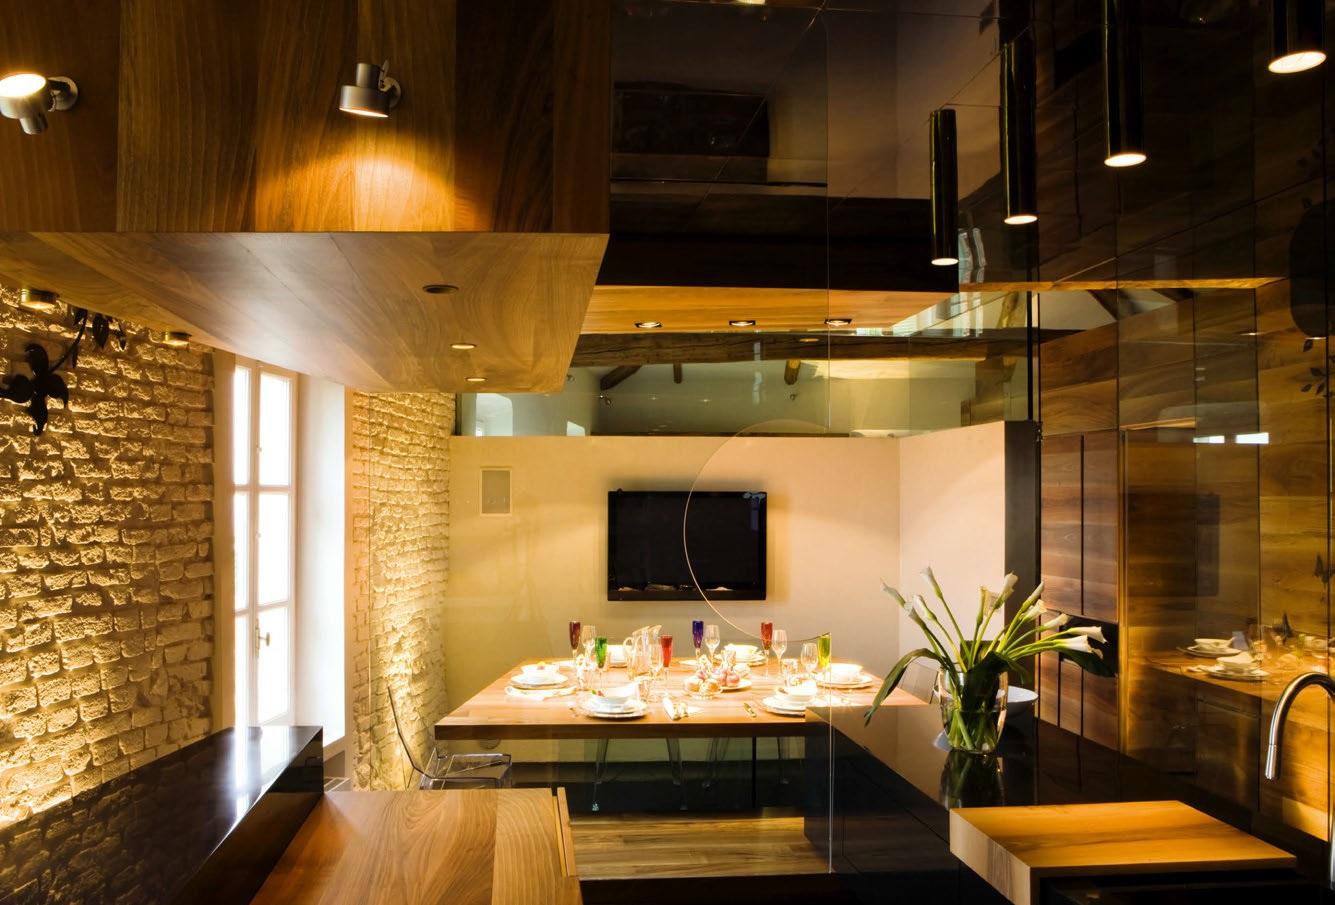 Arredamento moderno with arredamento interni moderno for Arredamento interni veneto